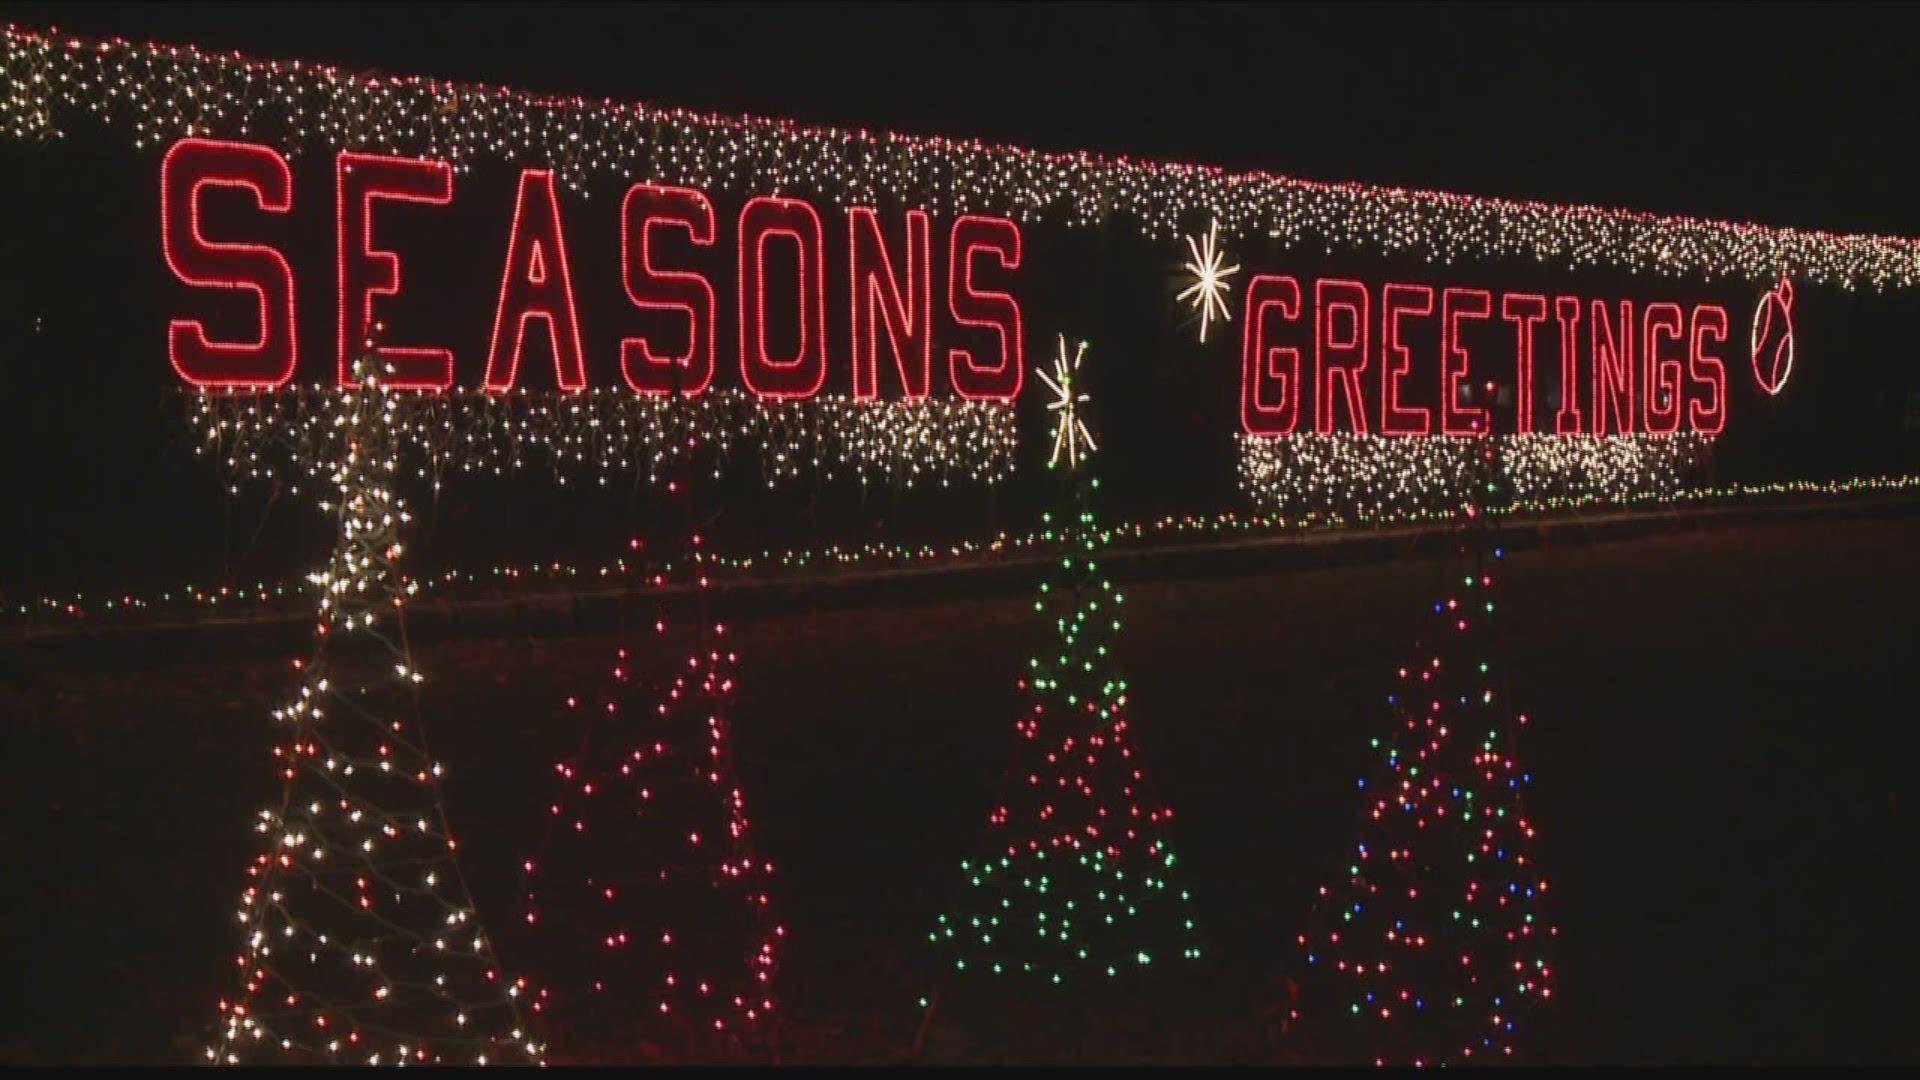 Tilles Park Christmas Lights.More Than 1 Million Christmas Lights Are On Display In Tilles Park